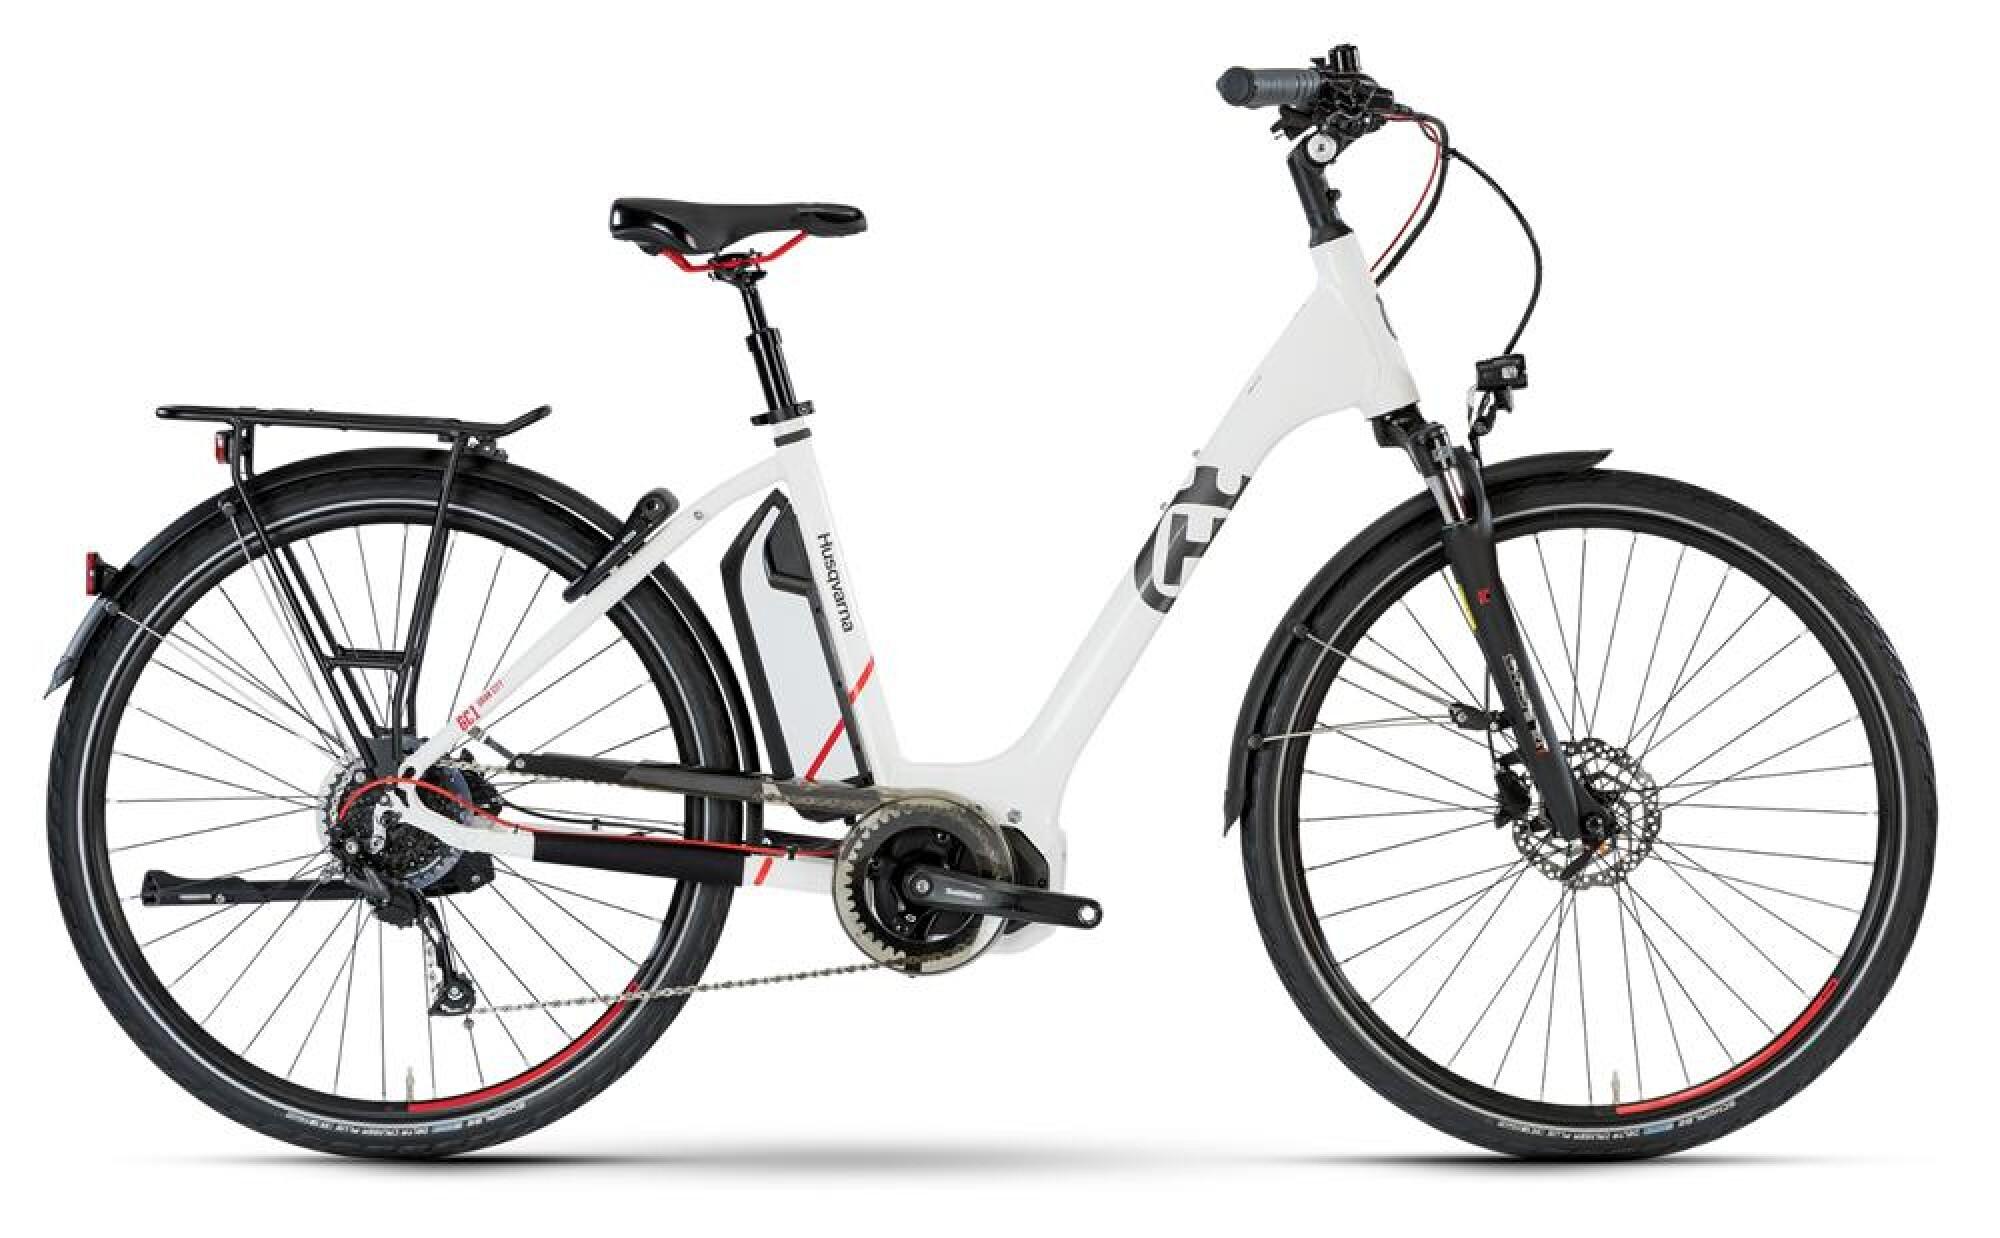 e bike husqvarna bicycles gran city gc1 2018 bei onbikex. Black Bedroom Furniture Sets. Home Design Ideas